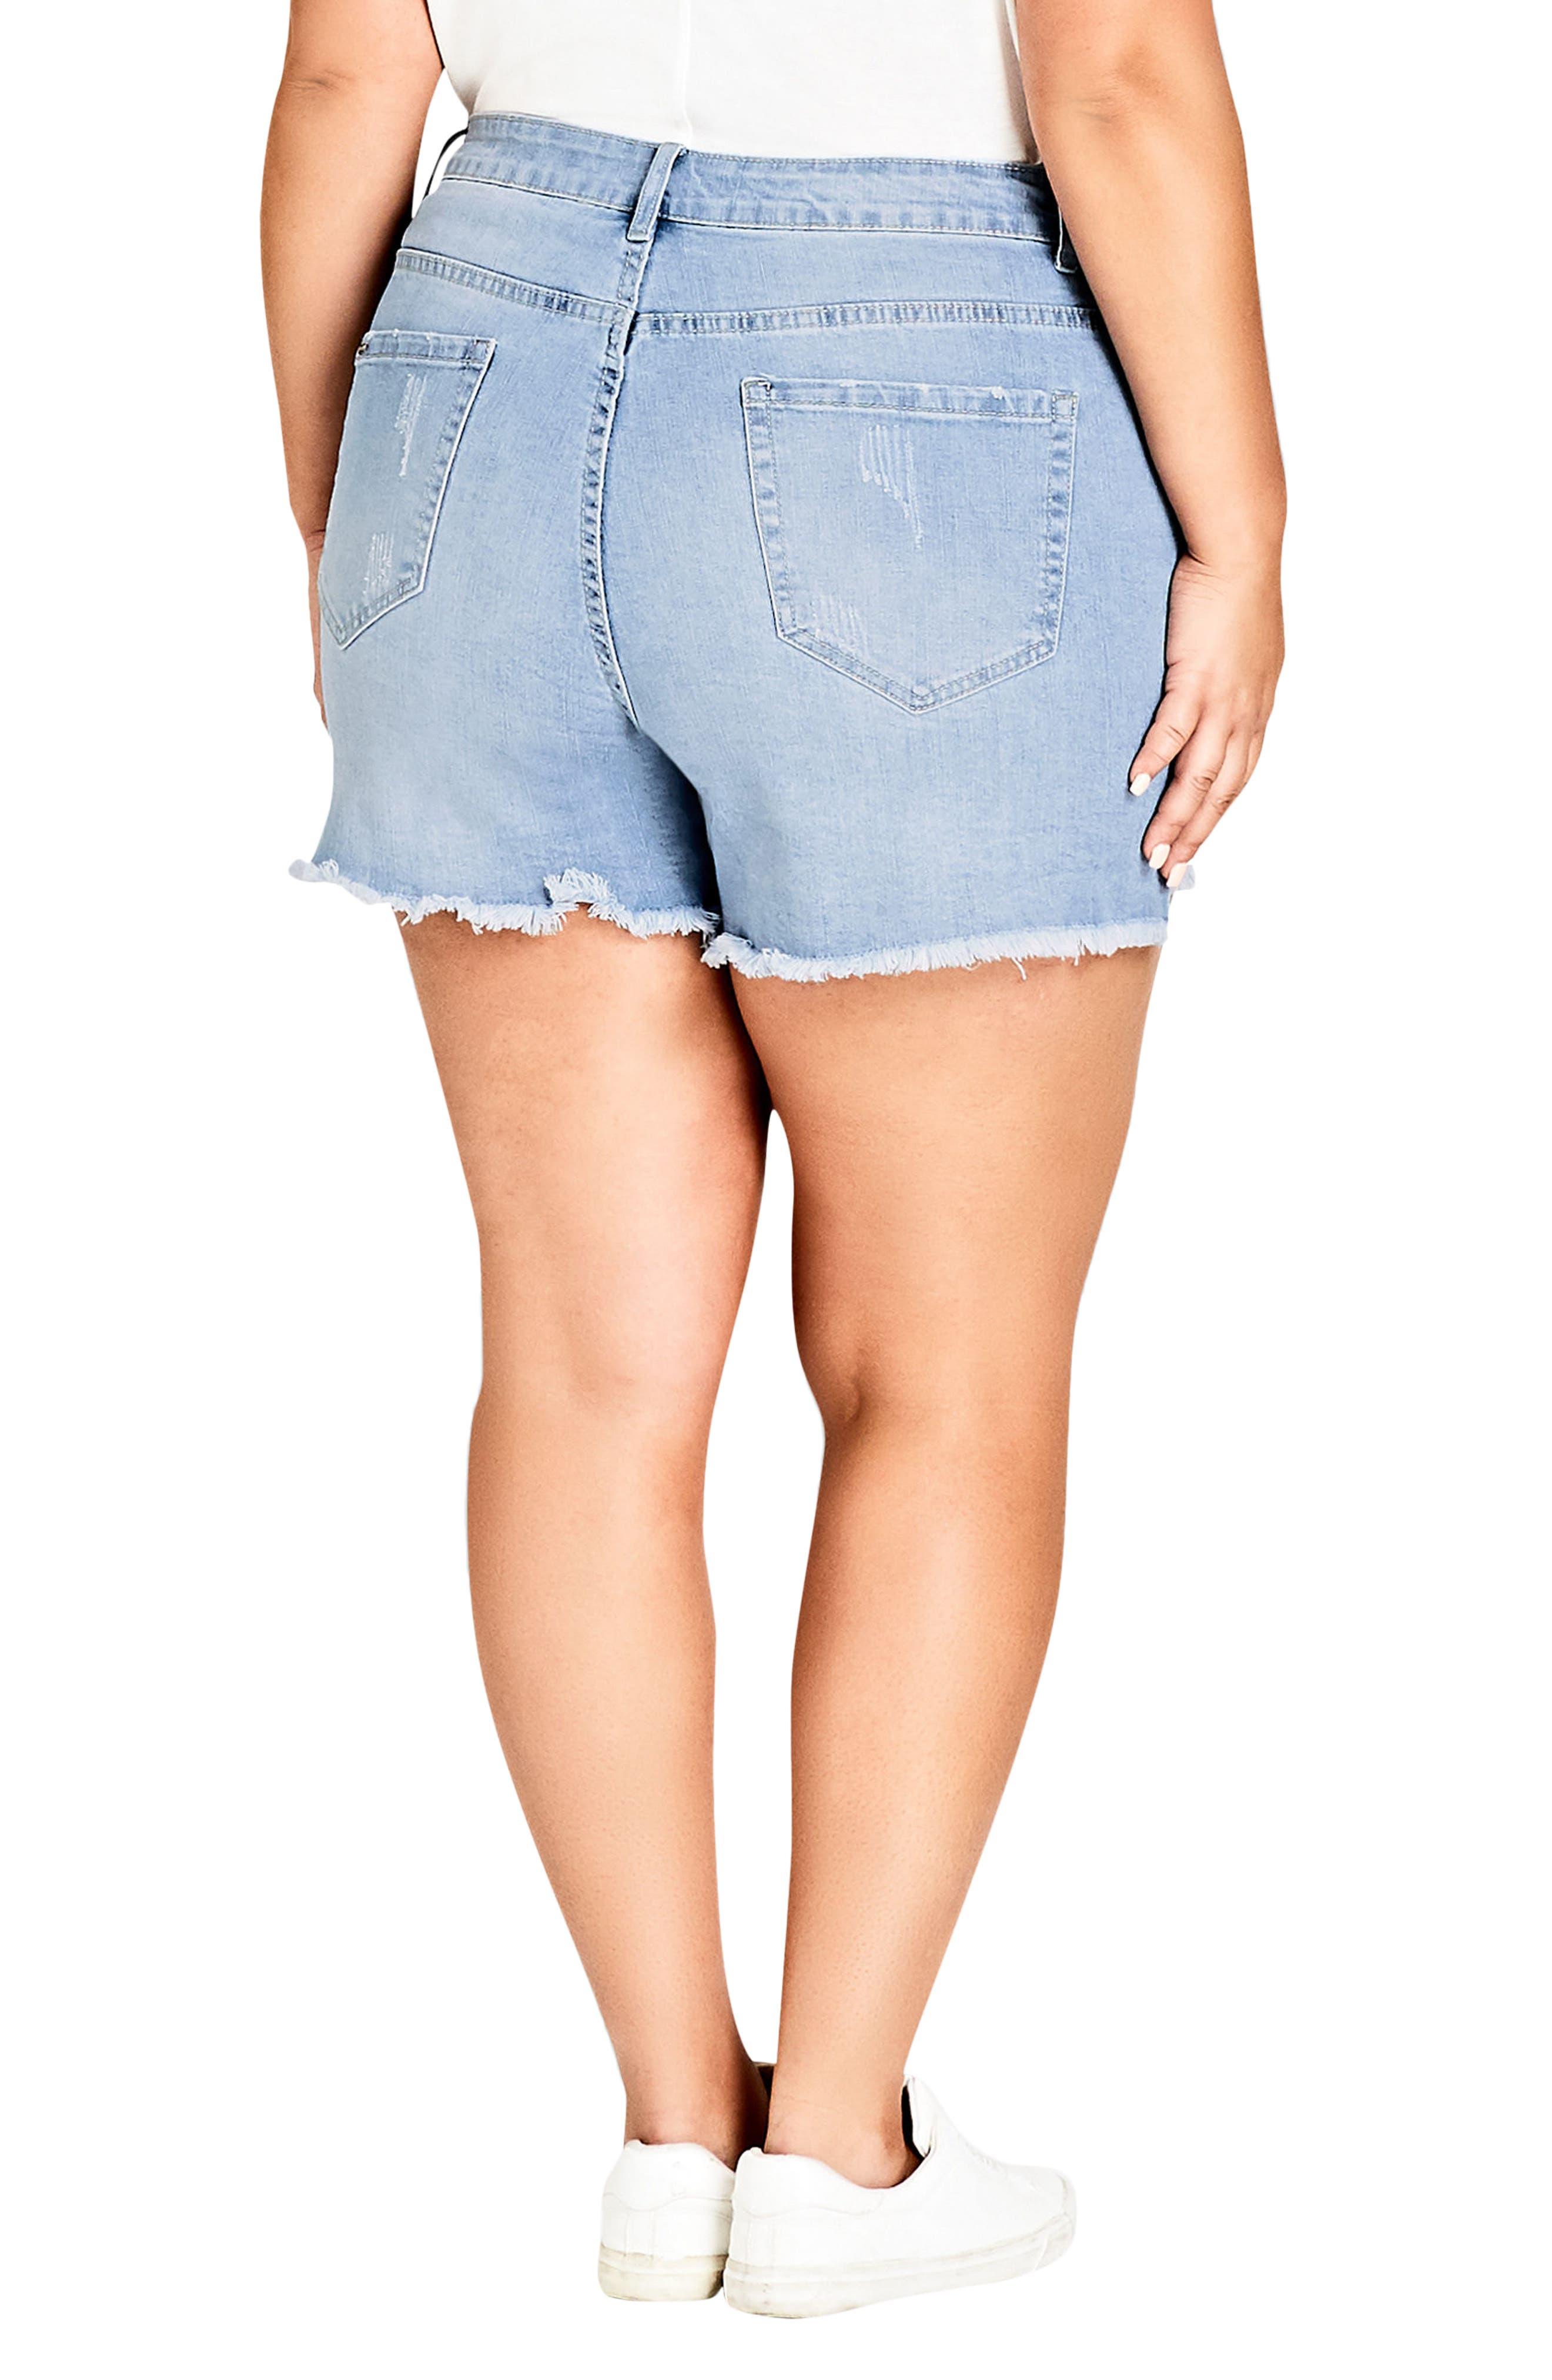 Sweet Cut Out Denim Shorts,                             Alternate thumbnail 2, color,                             401